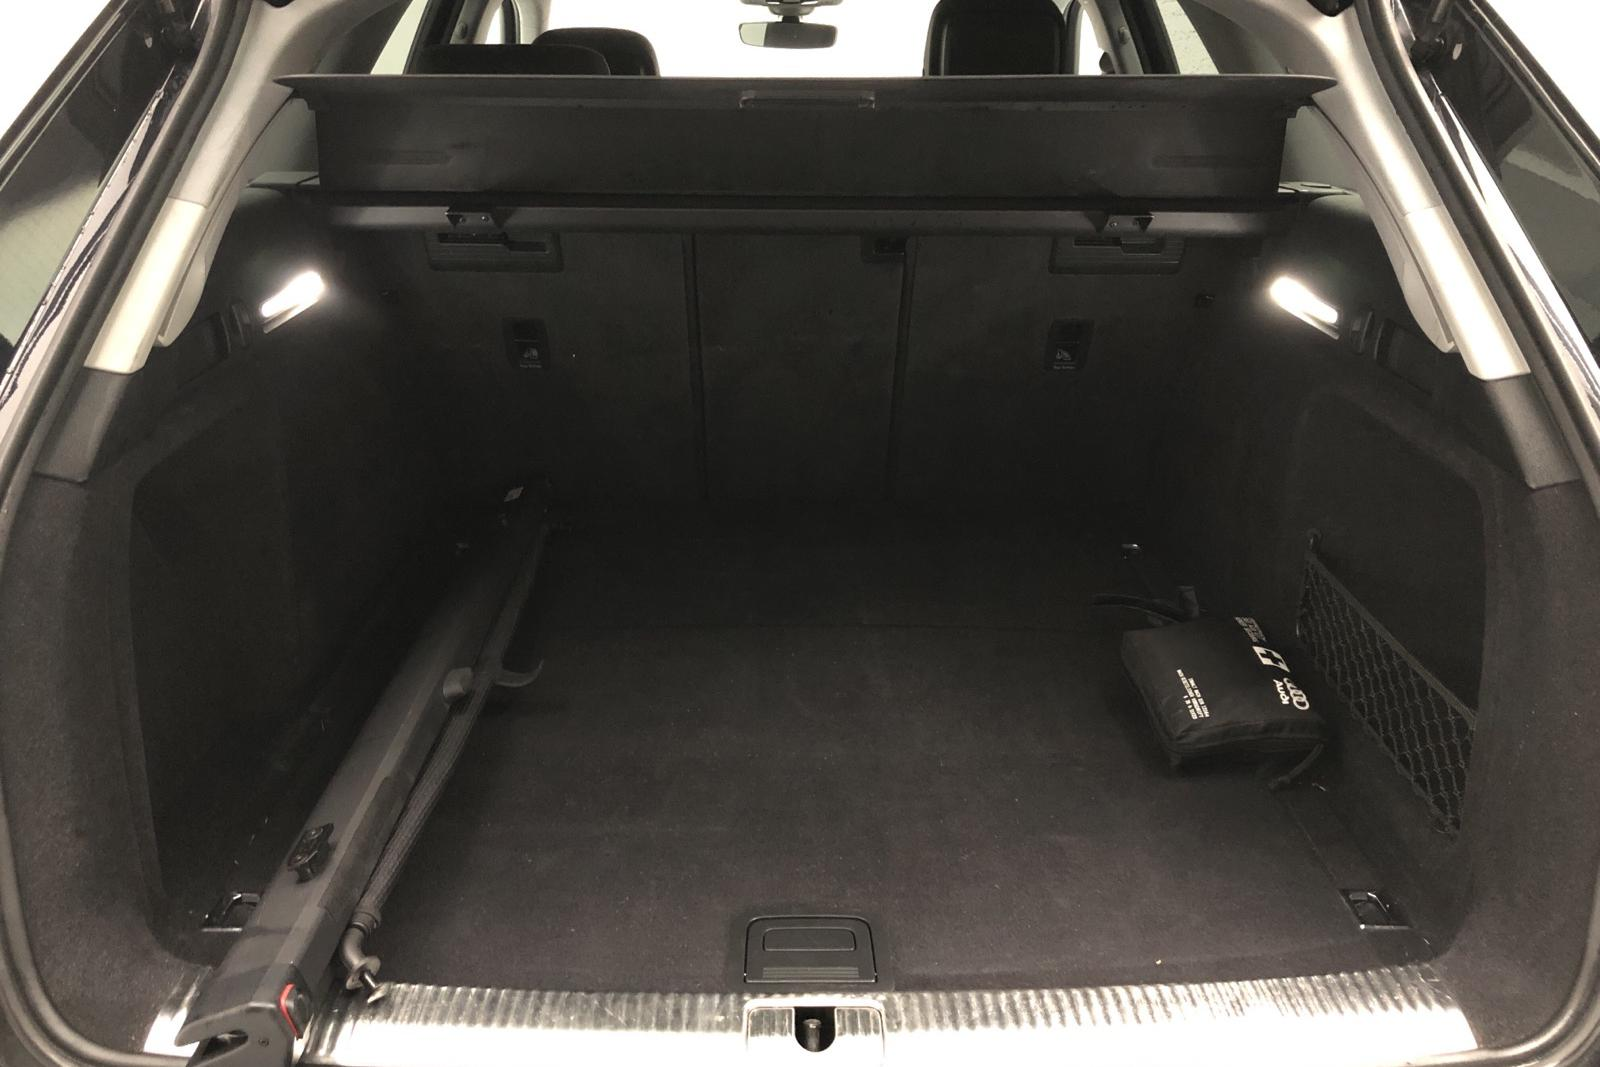 Audi A4 2.0 TDI Avant quattro (190hk) - 97 490 km - Automatic - black - 2018